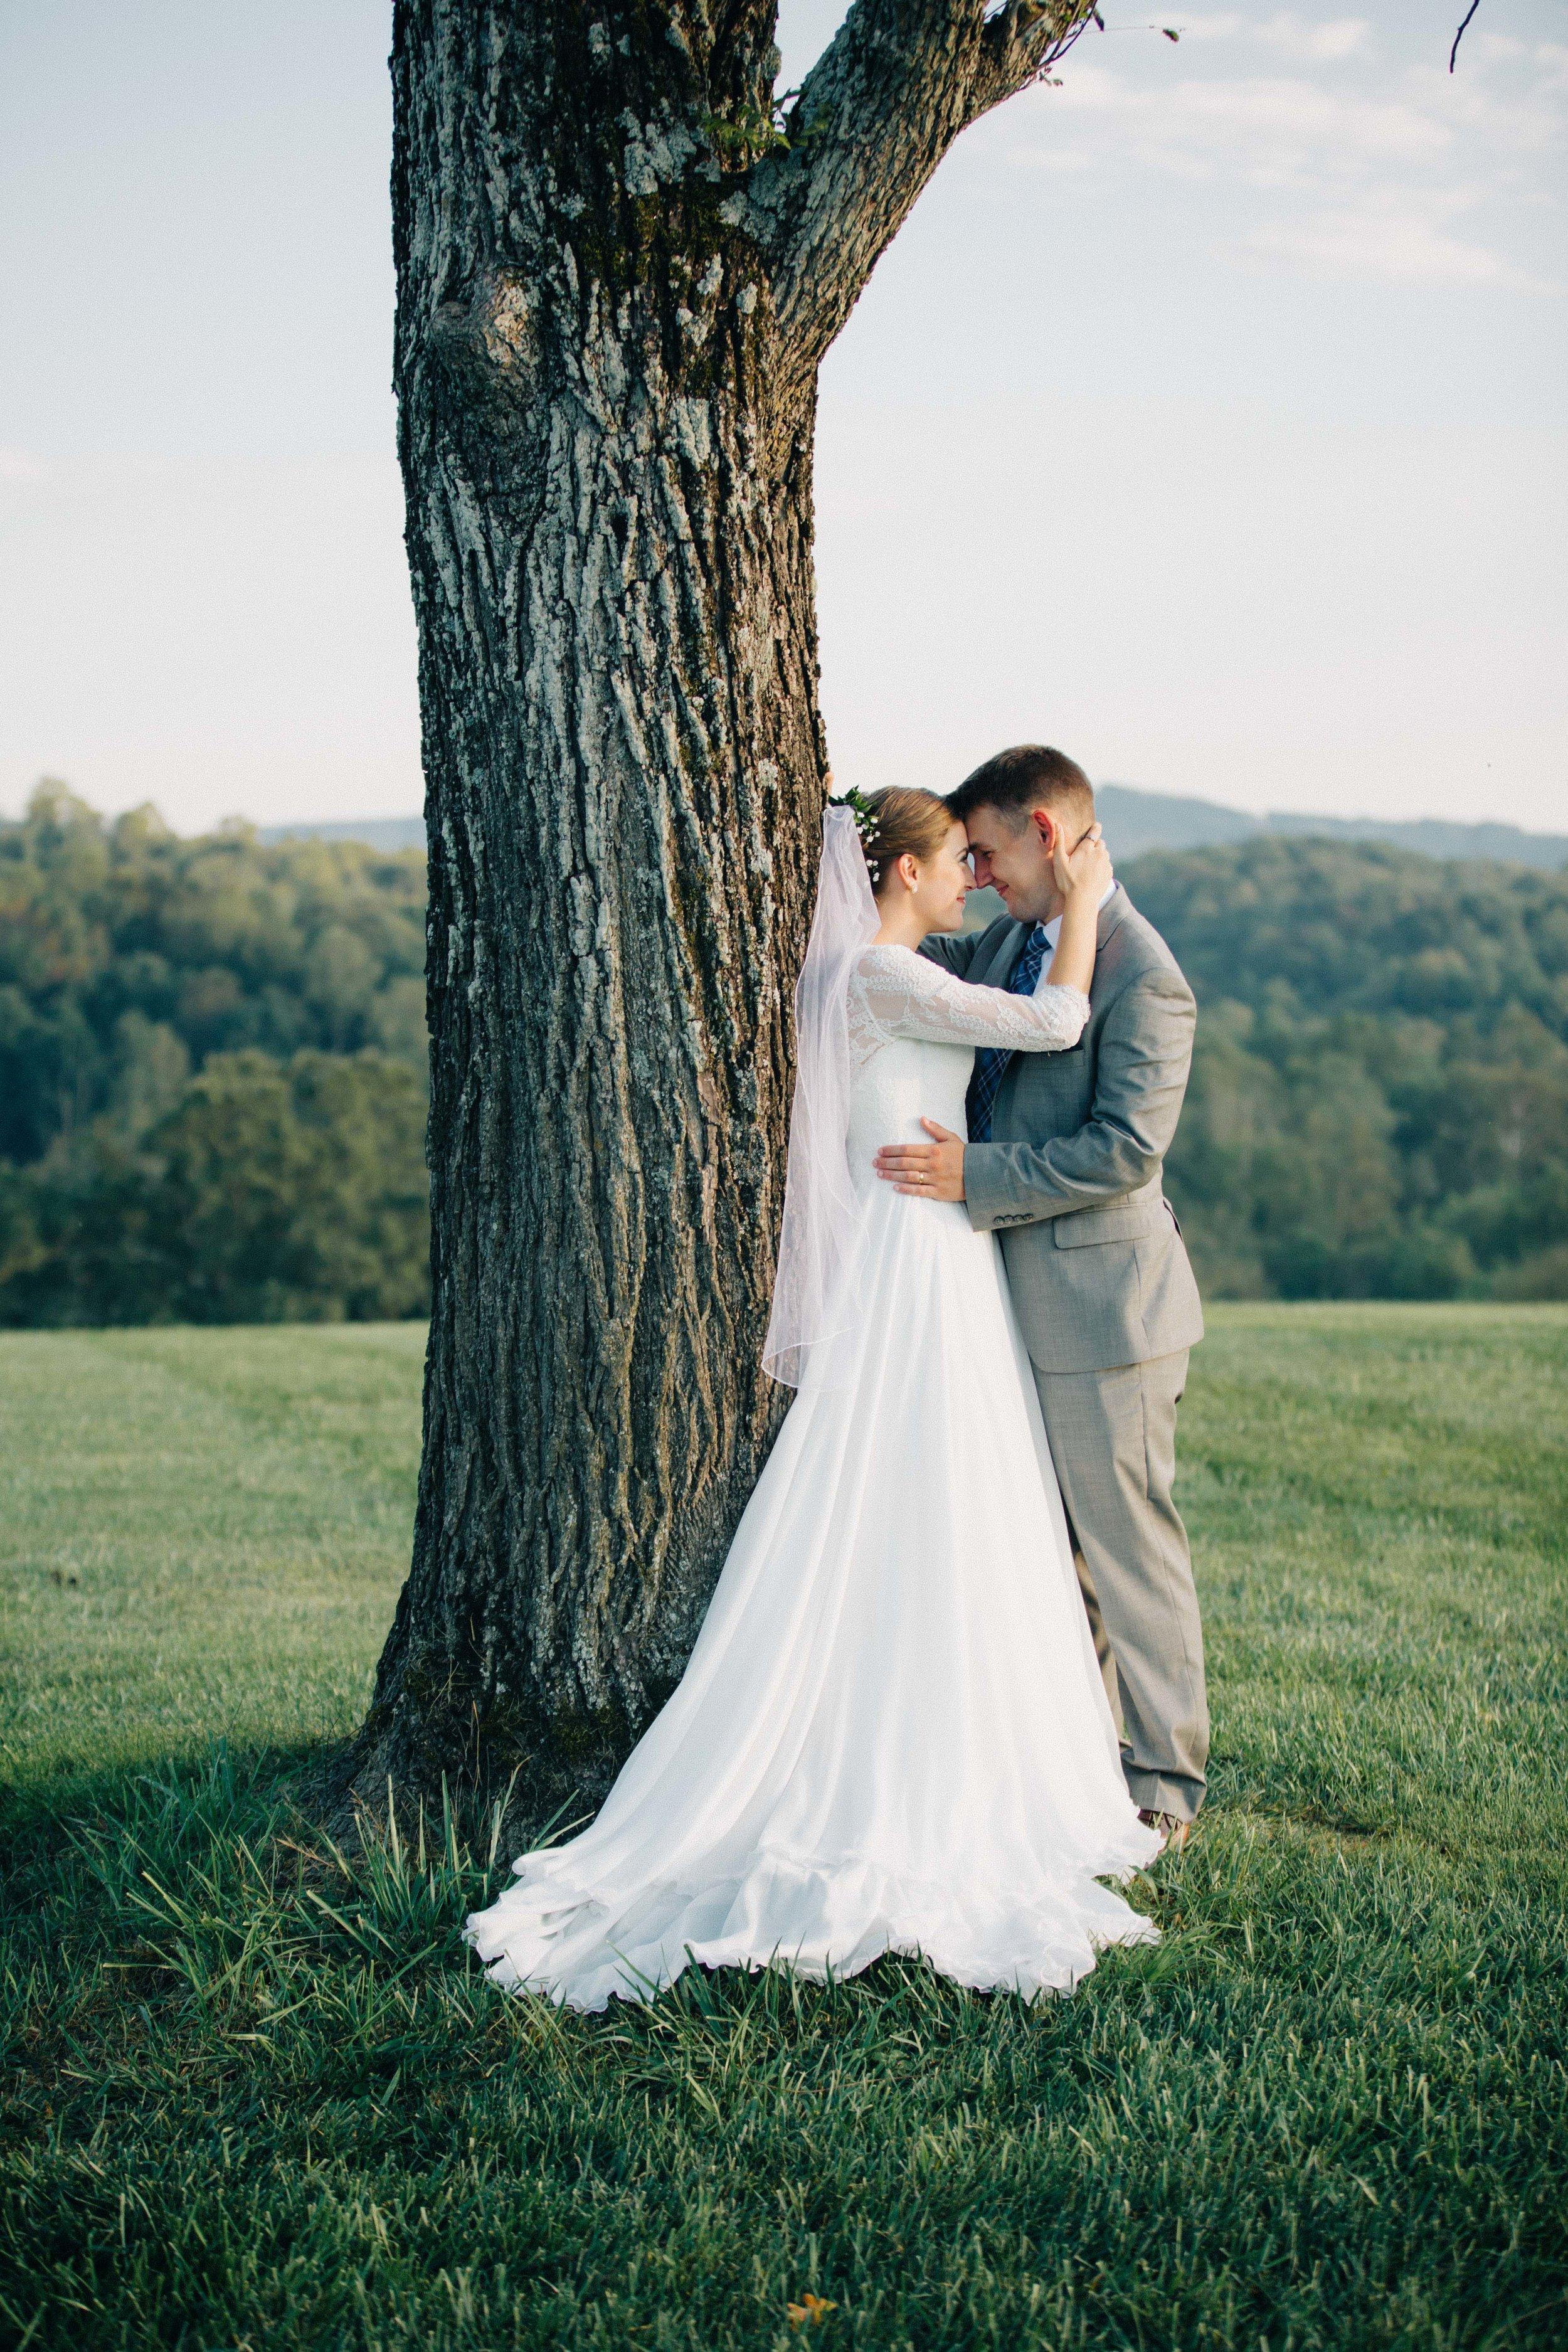 Earley_Wedding_WEB-40.jpg